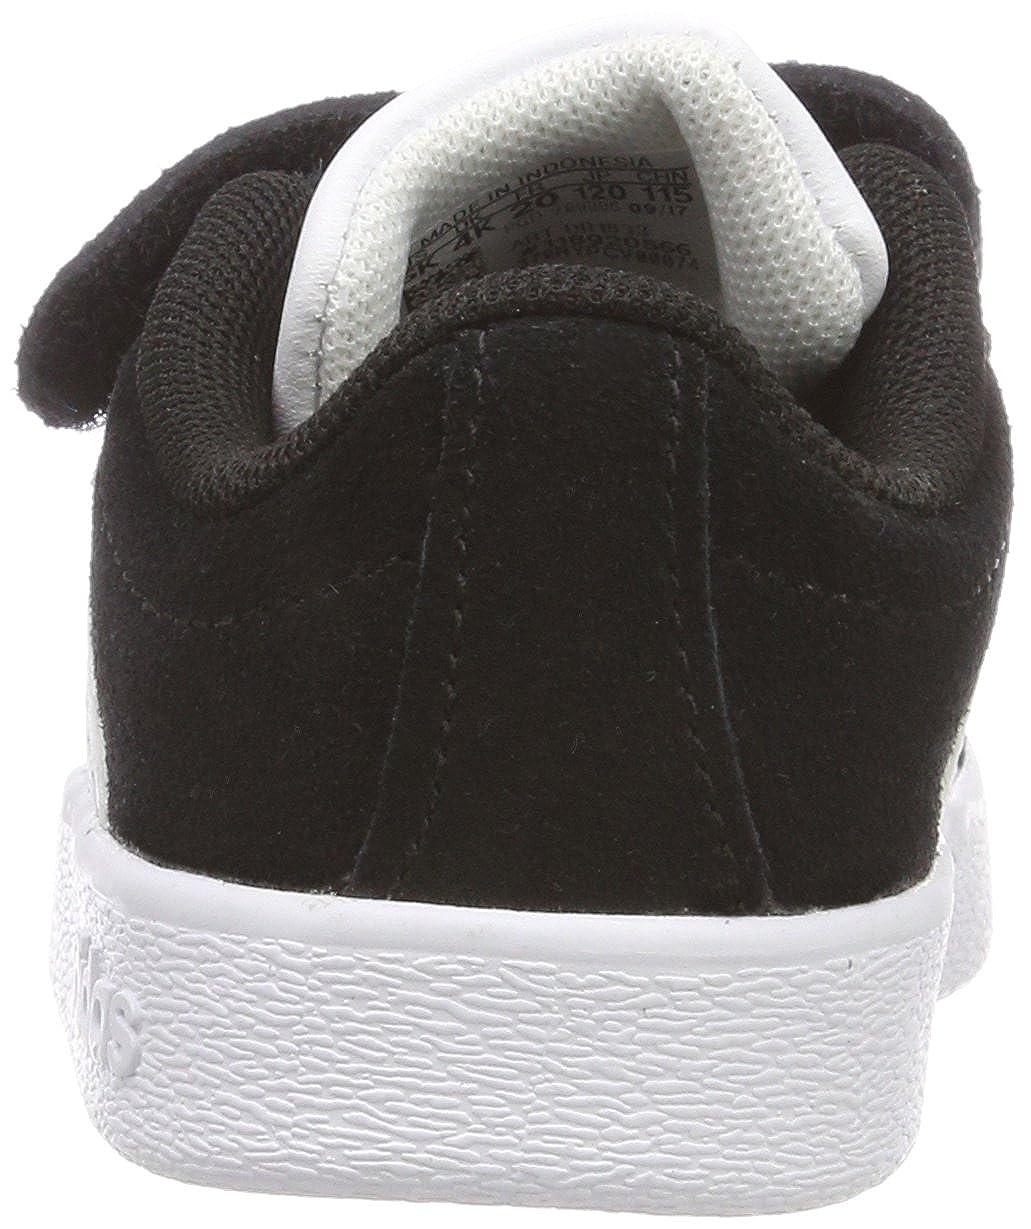 new product fe713 cb13d Adidas VL Court 2.0 Cmf I, Scarpe da Ginnastica Basse Unisex – Bimbi 0-24  DB1833